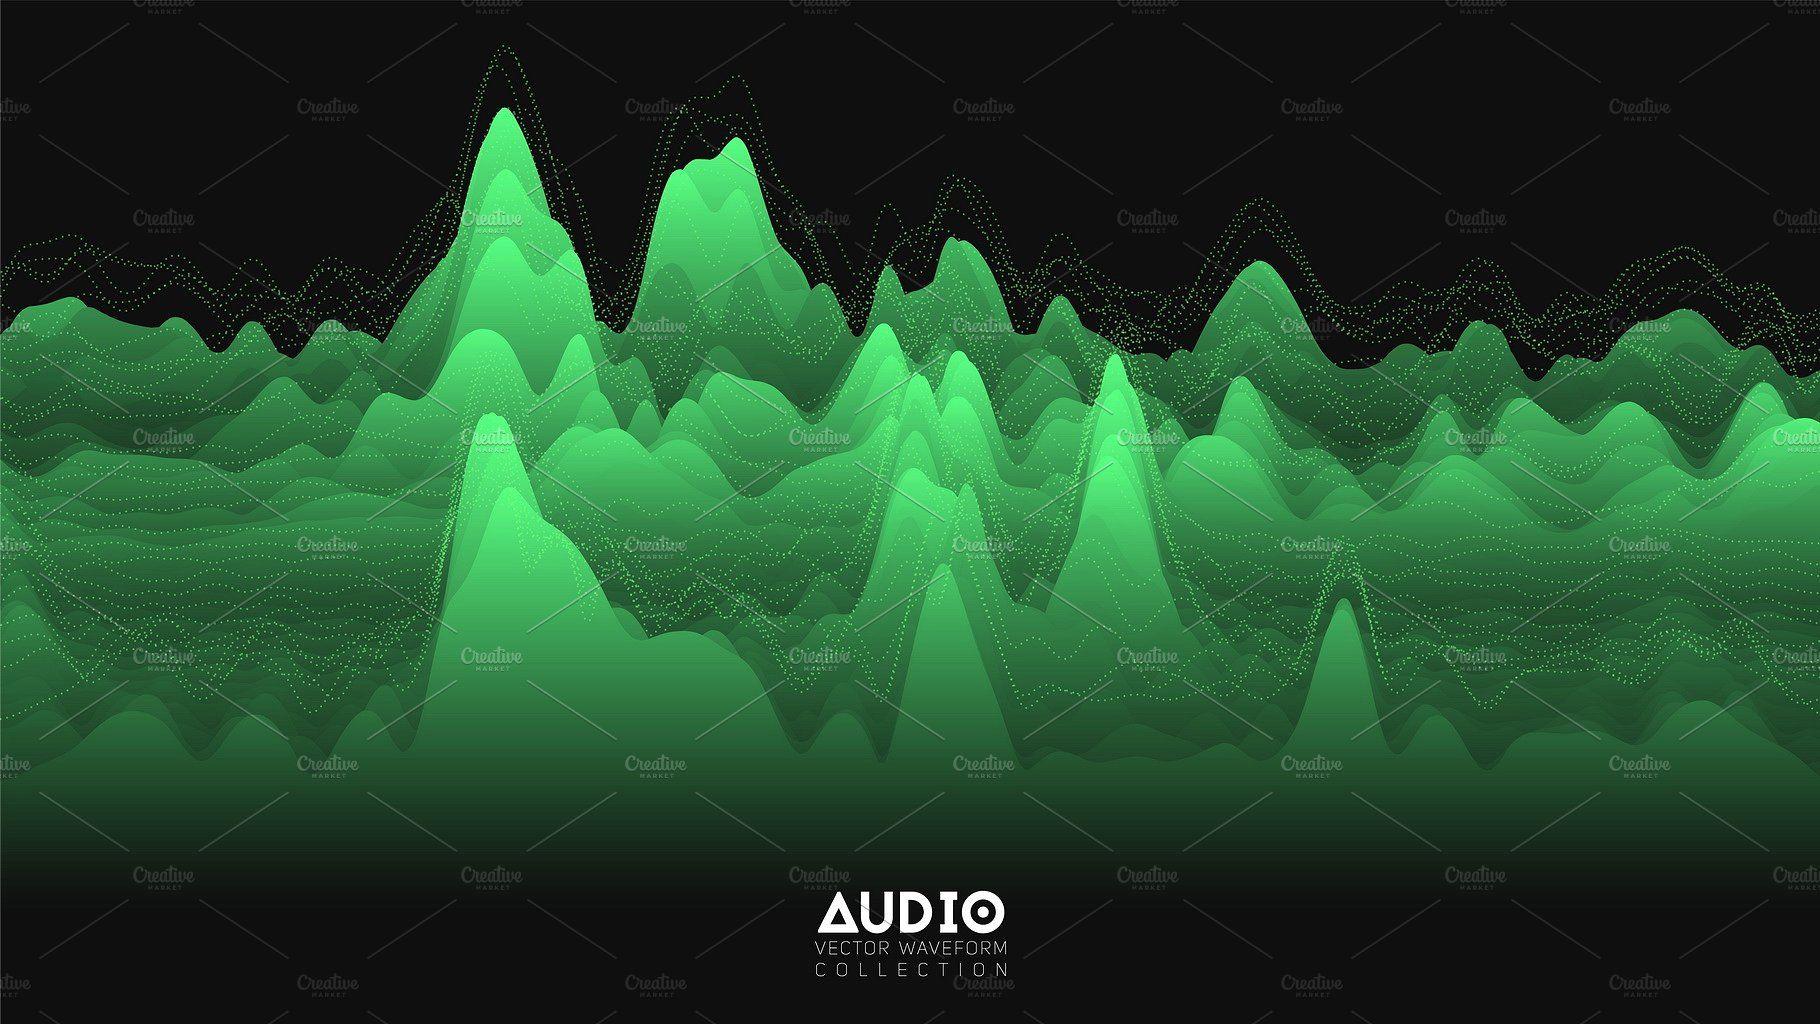 18 Audio Waveforms #wave#visualization#sound#oscillation | Creative